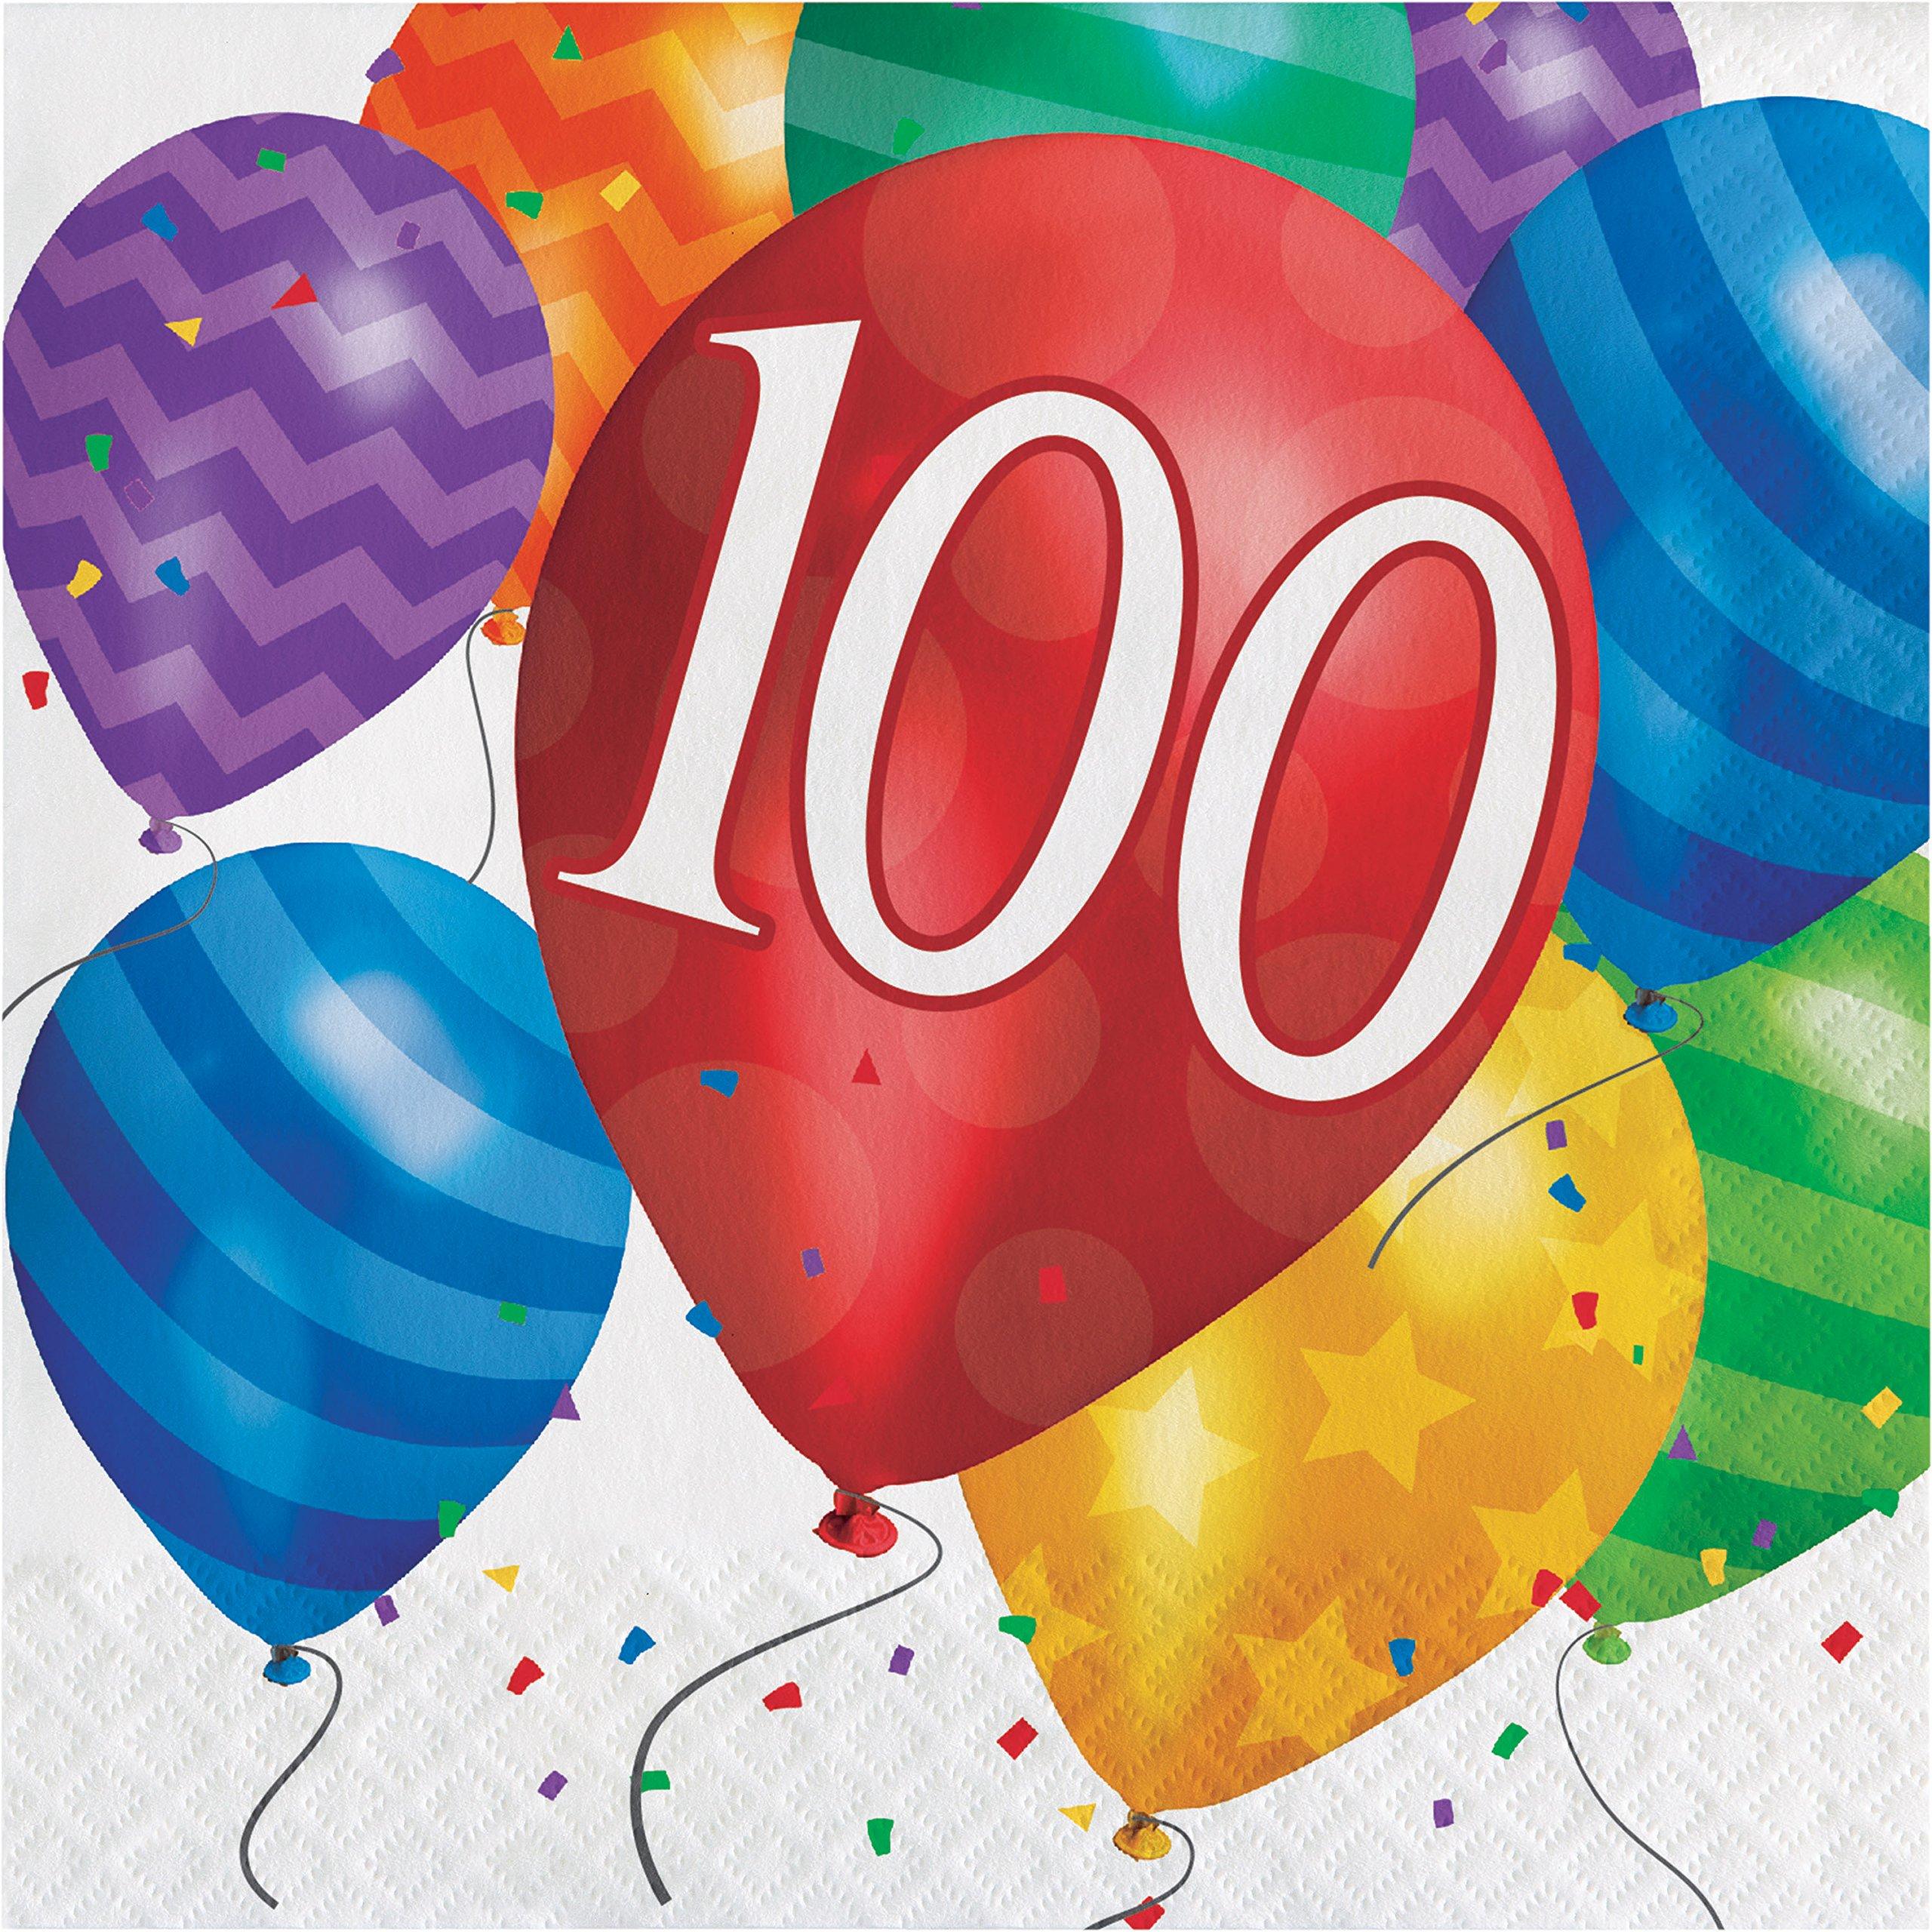 Balloon Blast 100th Birthday Napkins, 48 ct